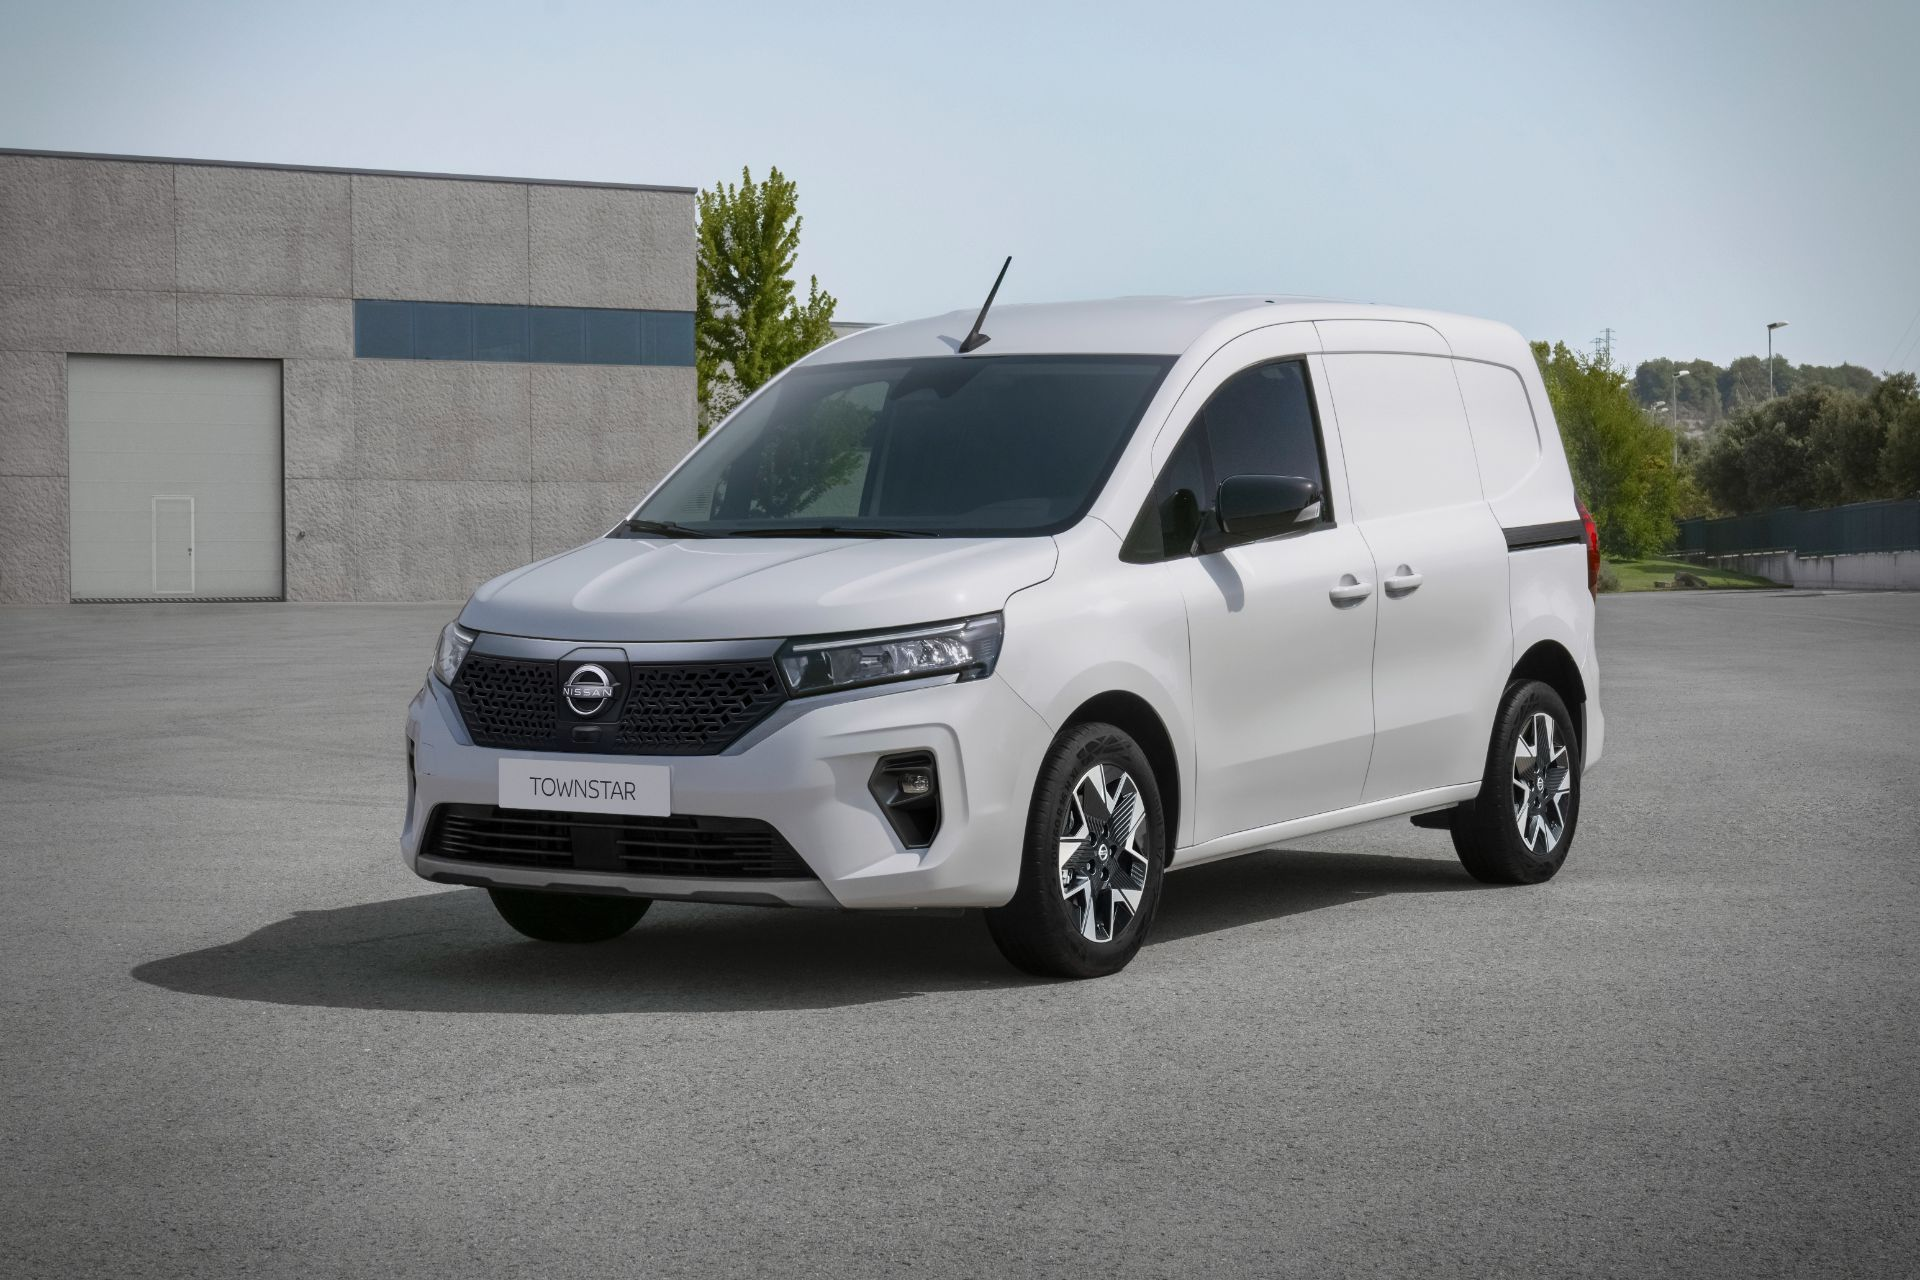 2022-Nissan-Townstar-EV-van-dynamic-5